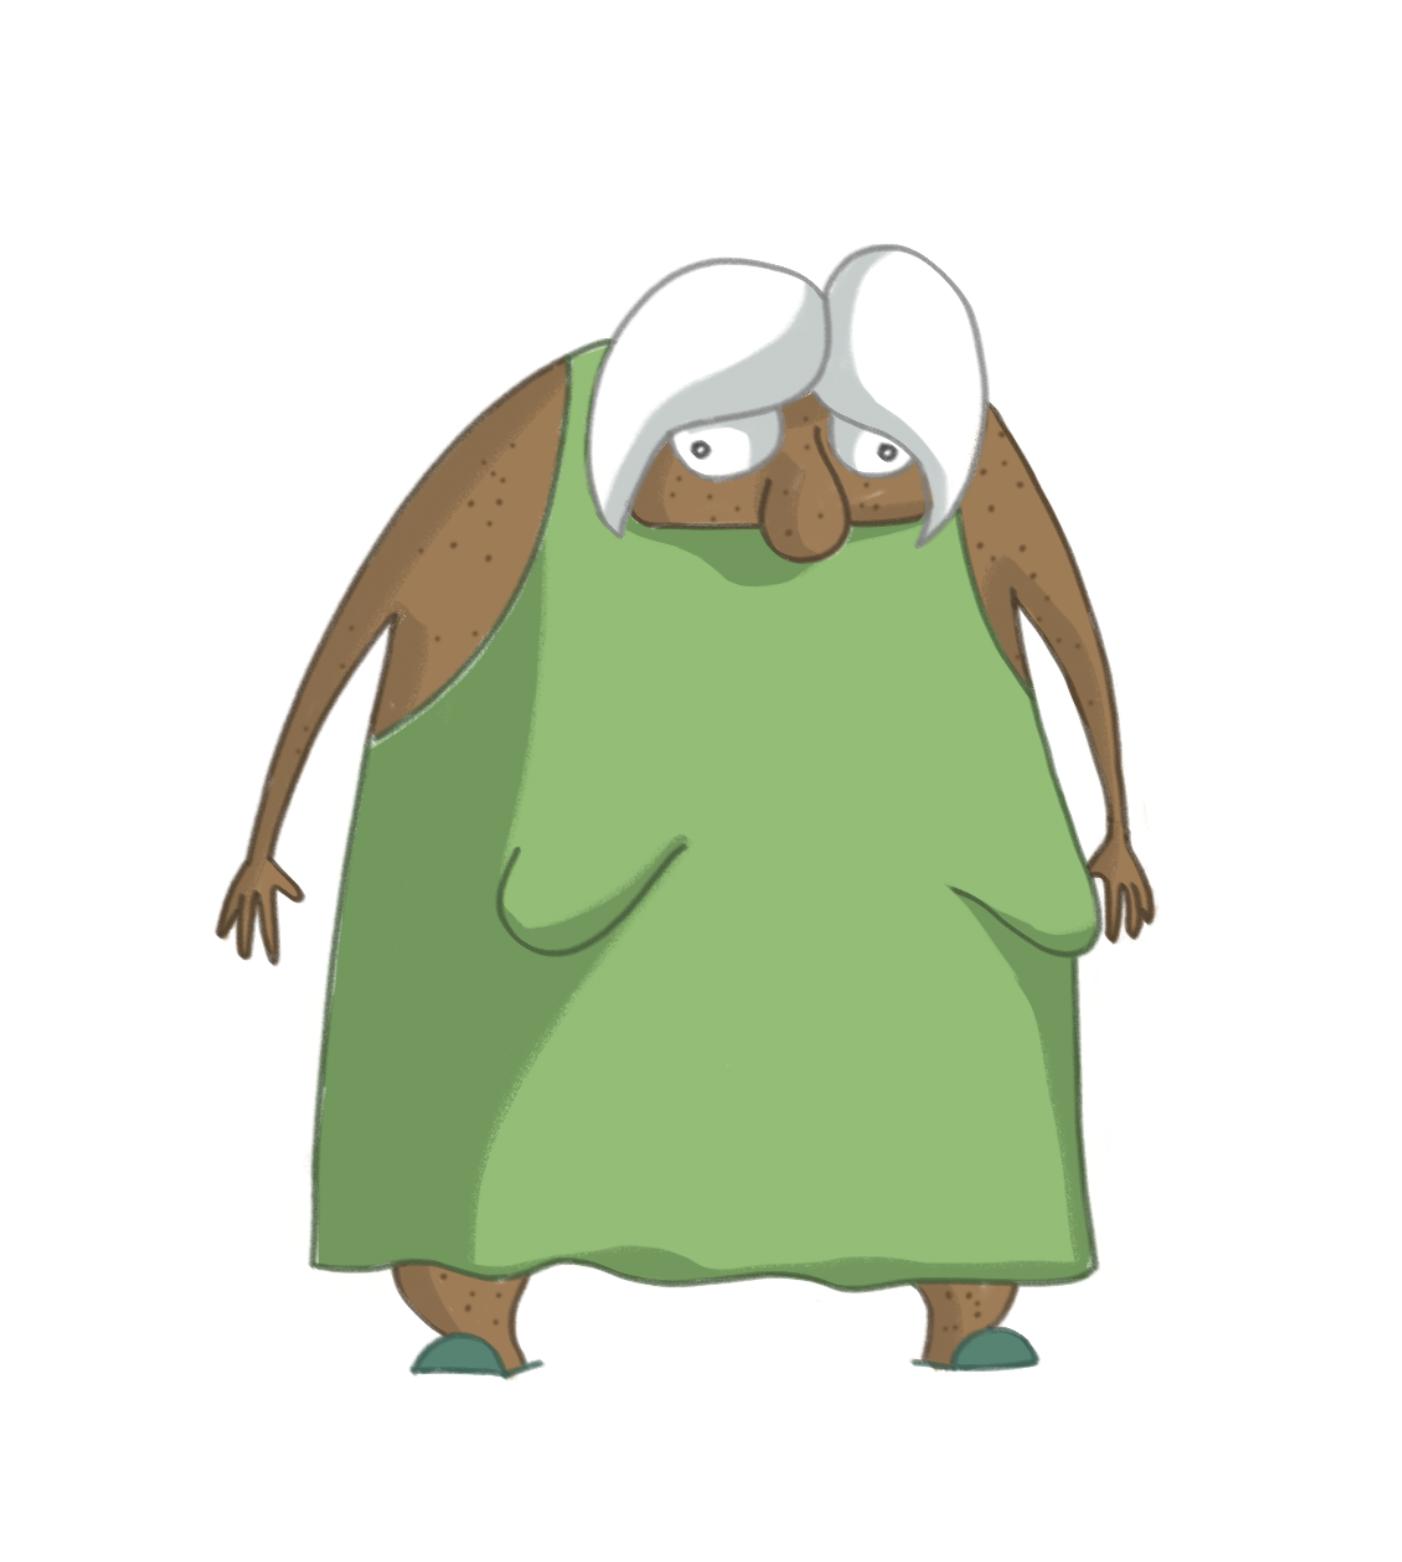 Pica Pica, Short Animated, Mojgan Ghanaatgar